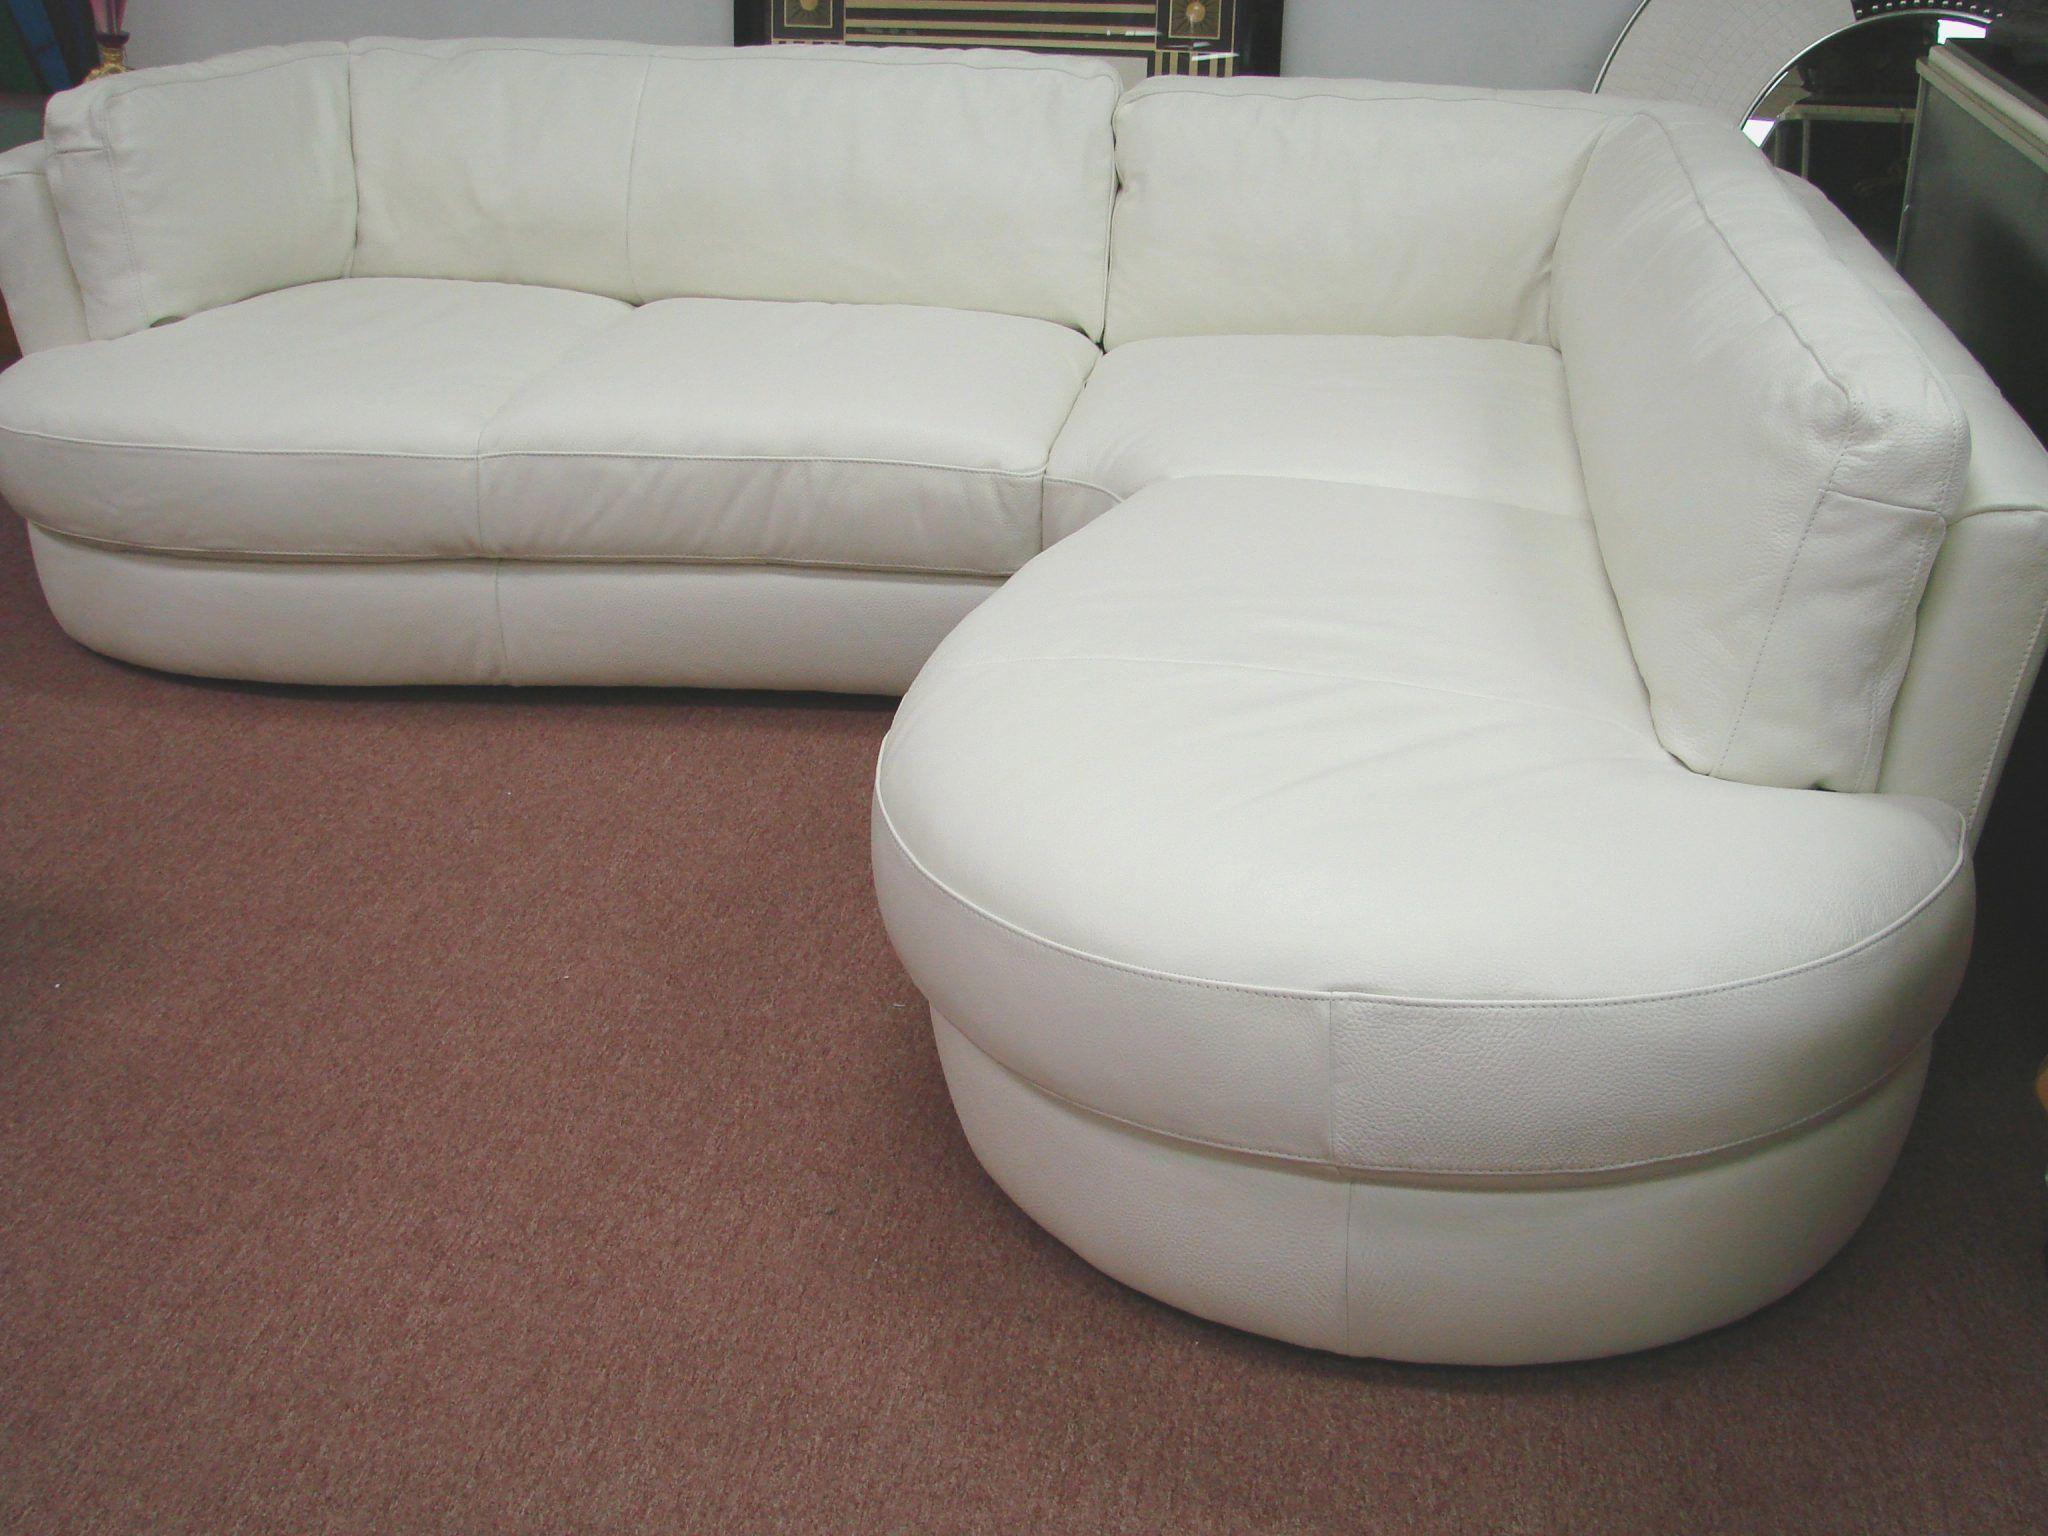 Macys Leather Sectional Sofa Macy S Furniture Leather Sectional Sofa Macy S Milano Brown Sectional Leather Sofa Macy S White Best Leather Sofa Leather Sofa